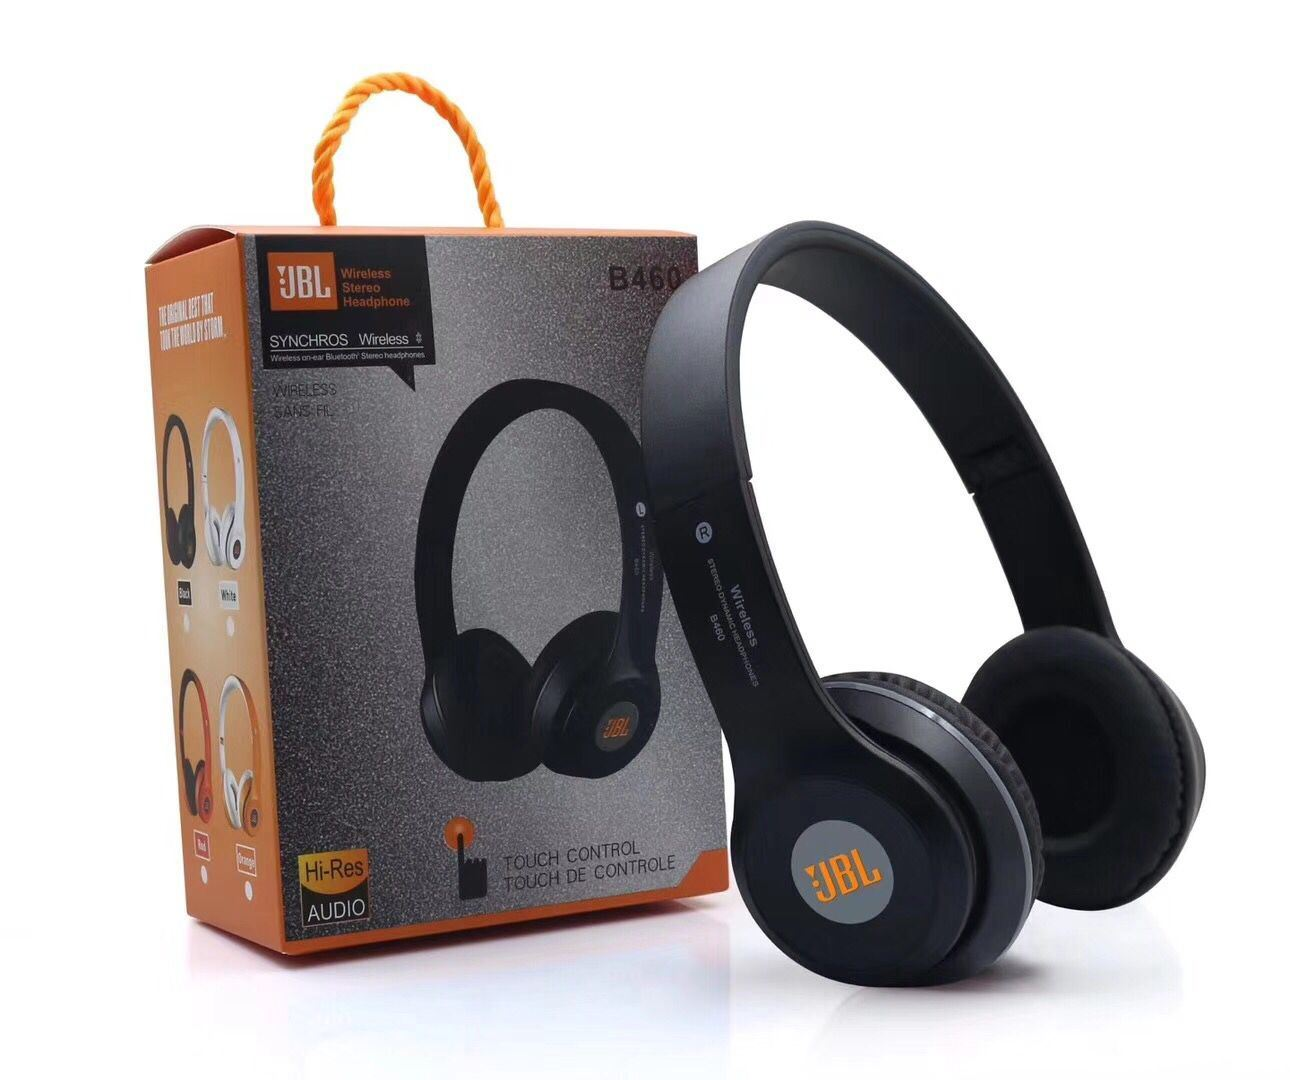 China Original Wireless Bluetooth Headphone For Jbl B460 With Tf Headset Jbll